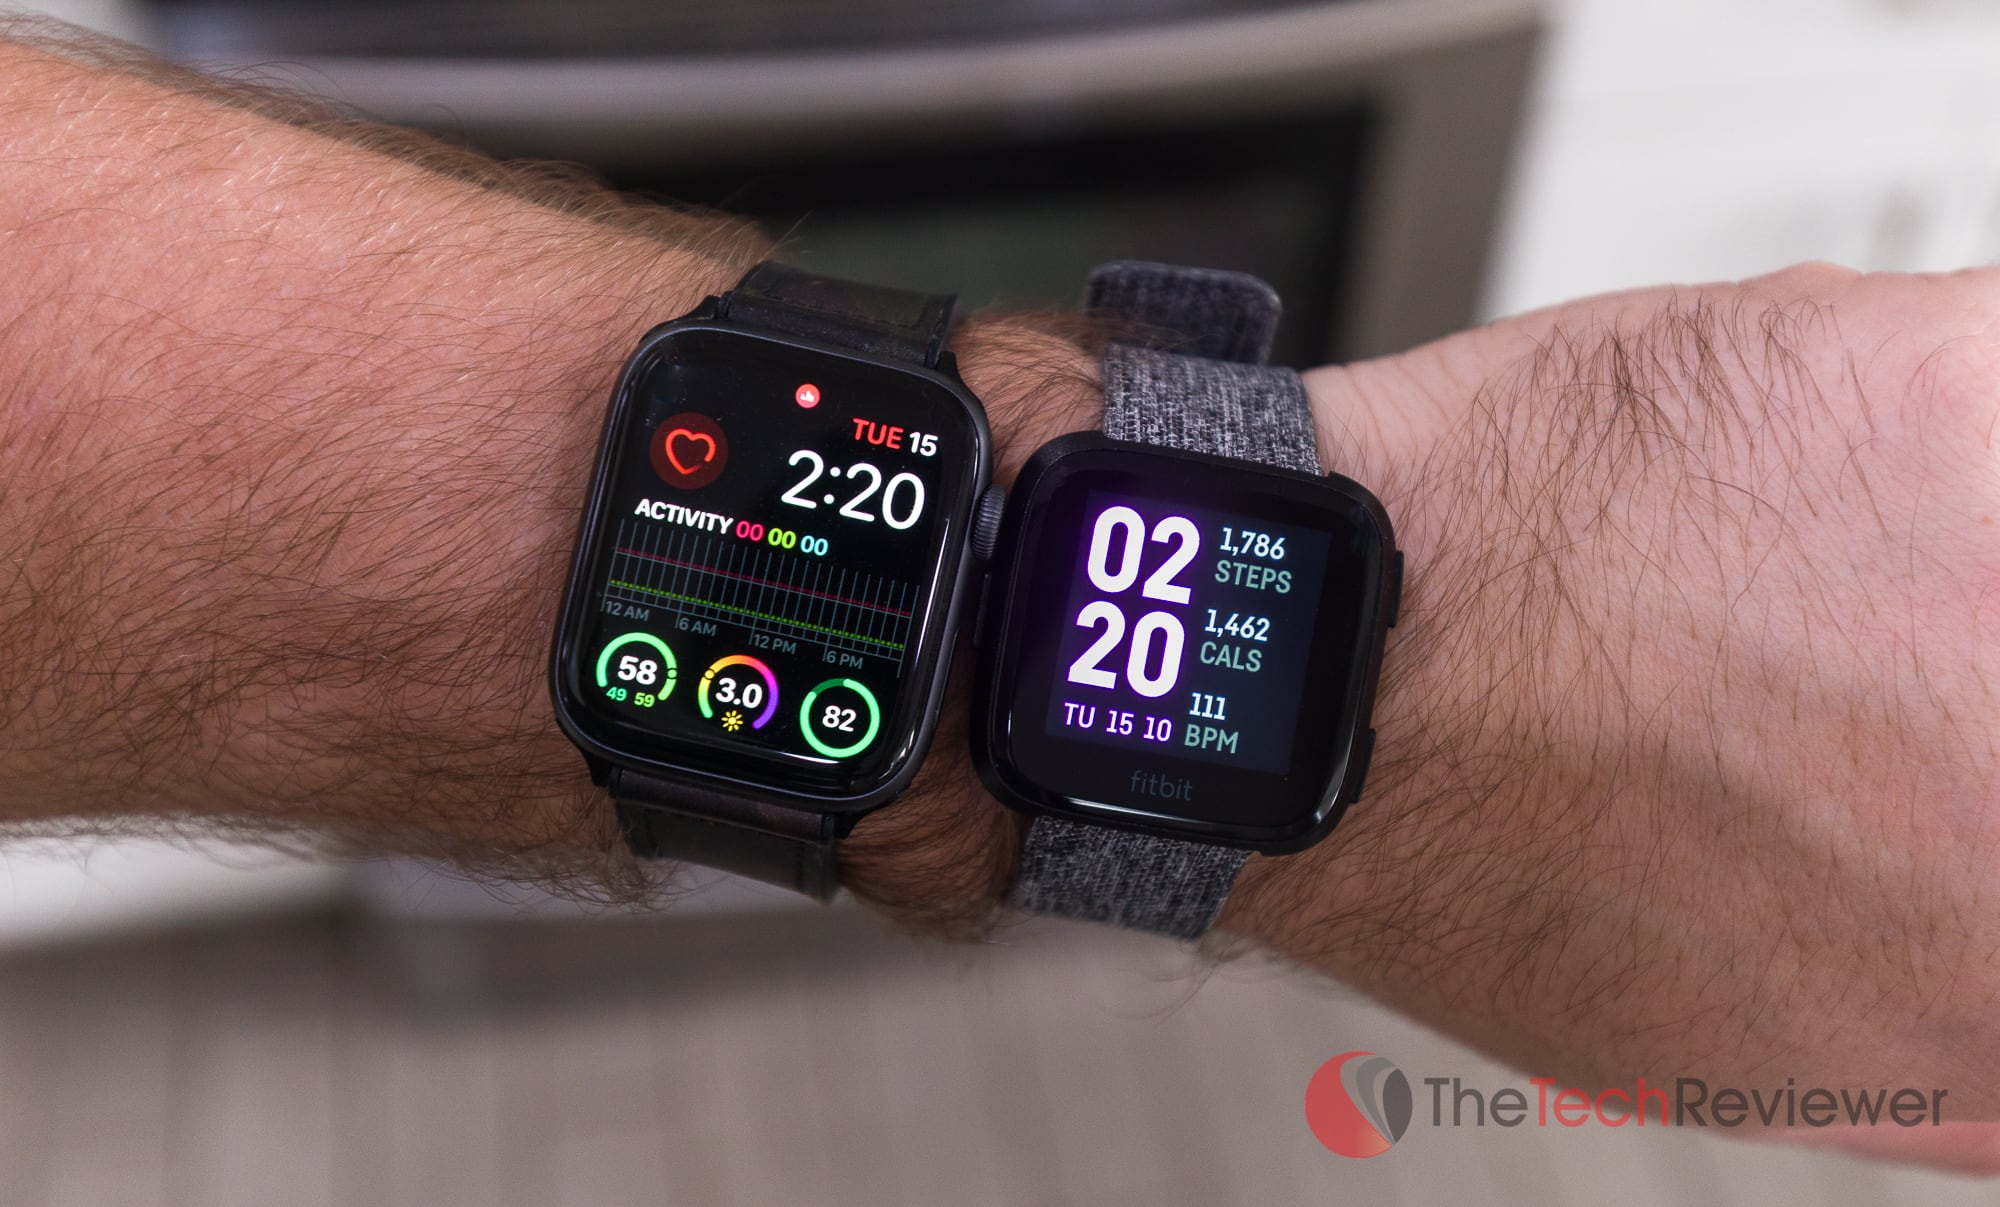 Apple Watch vs Versa Size